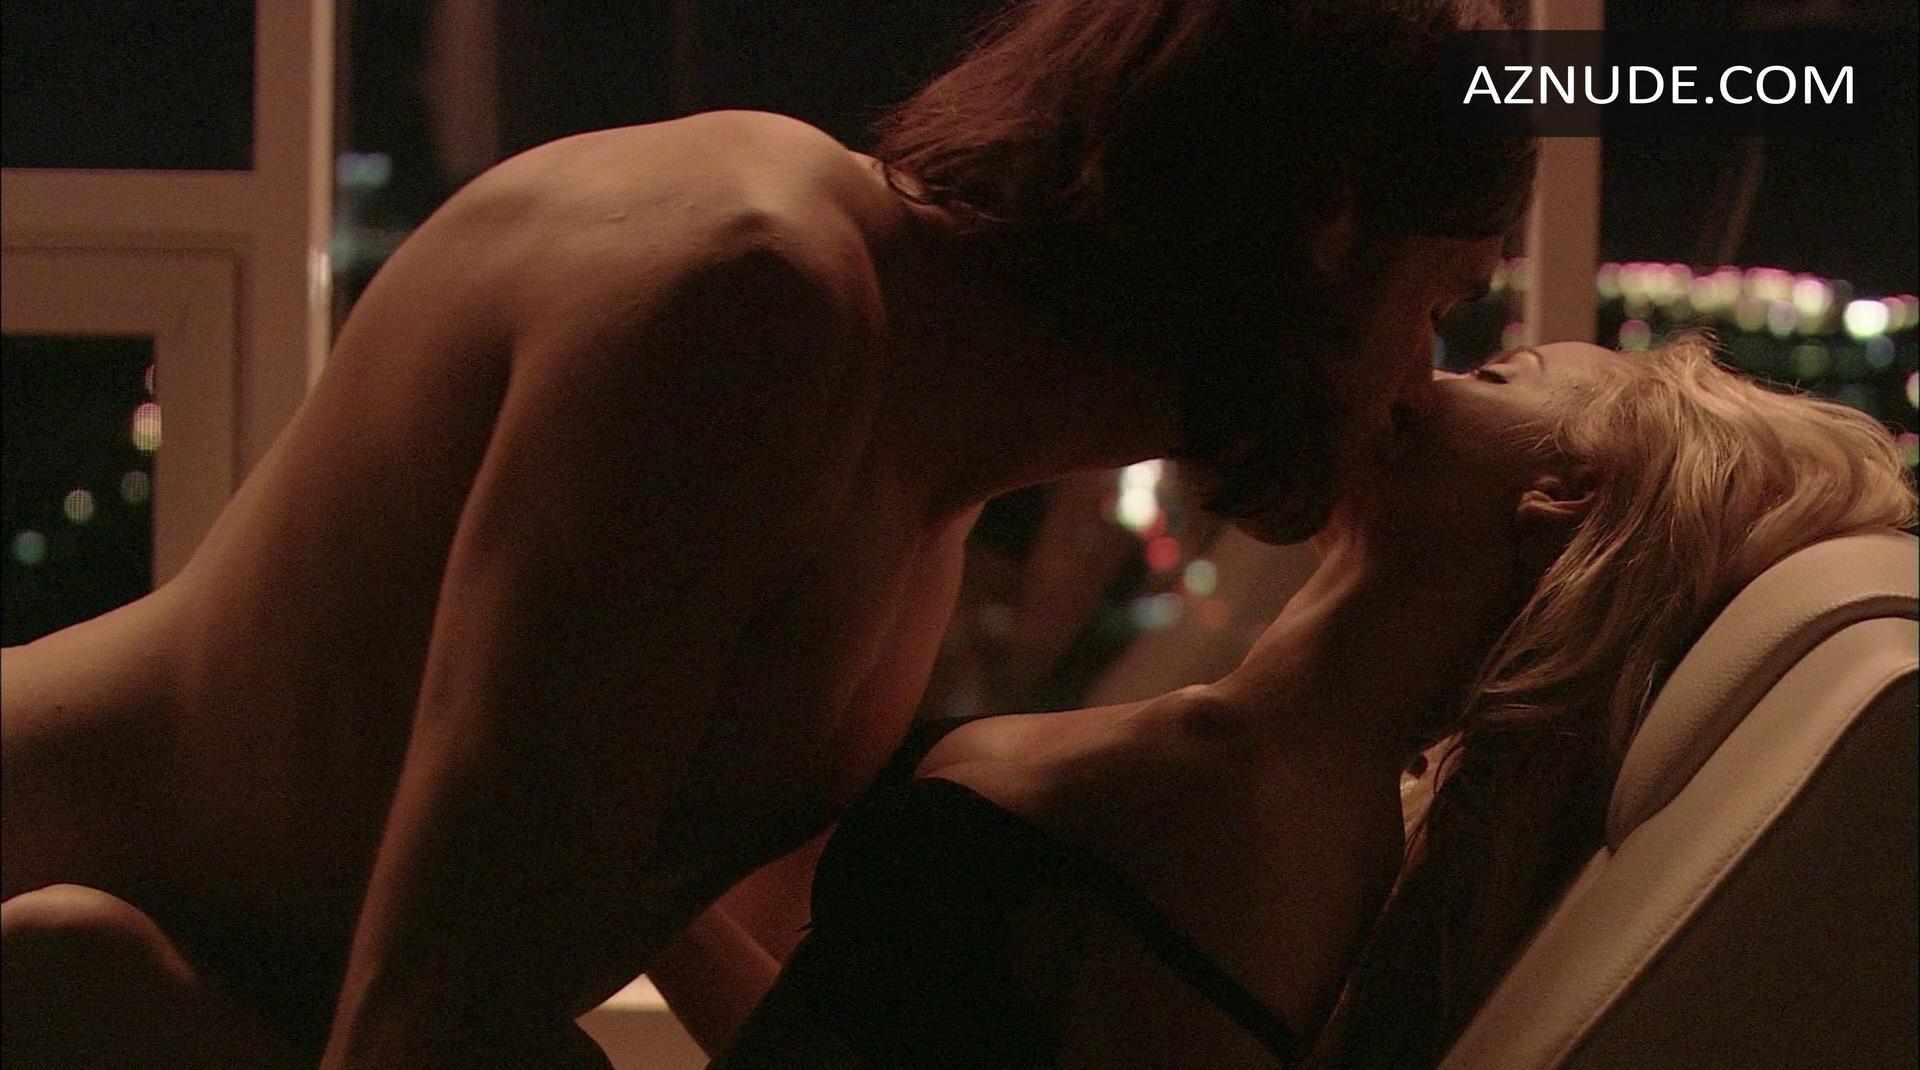 naked surrender movie on tv jpg 1080x810